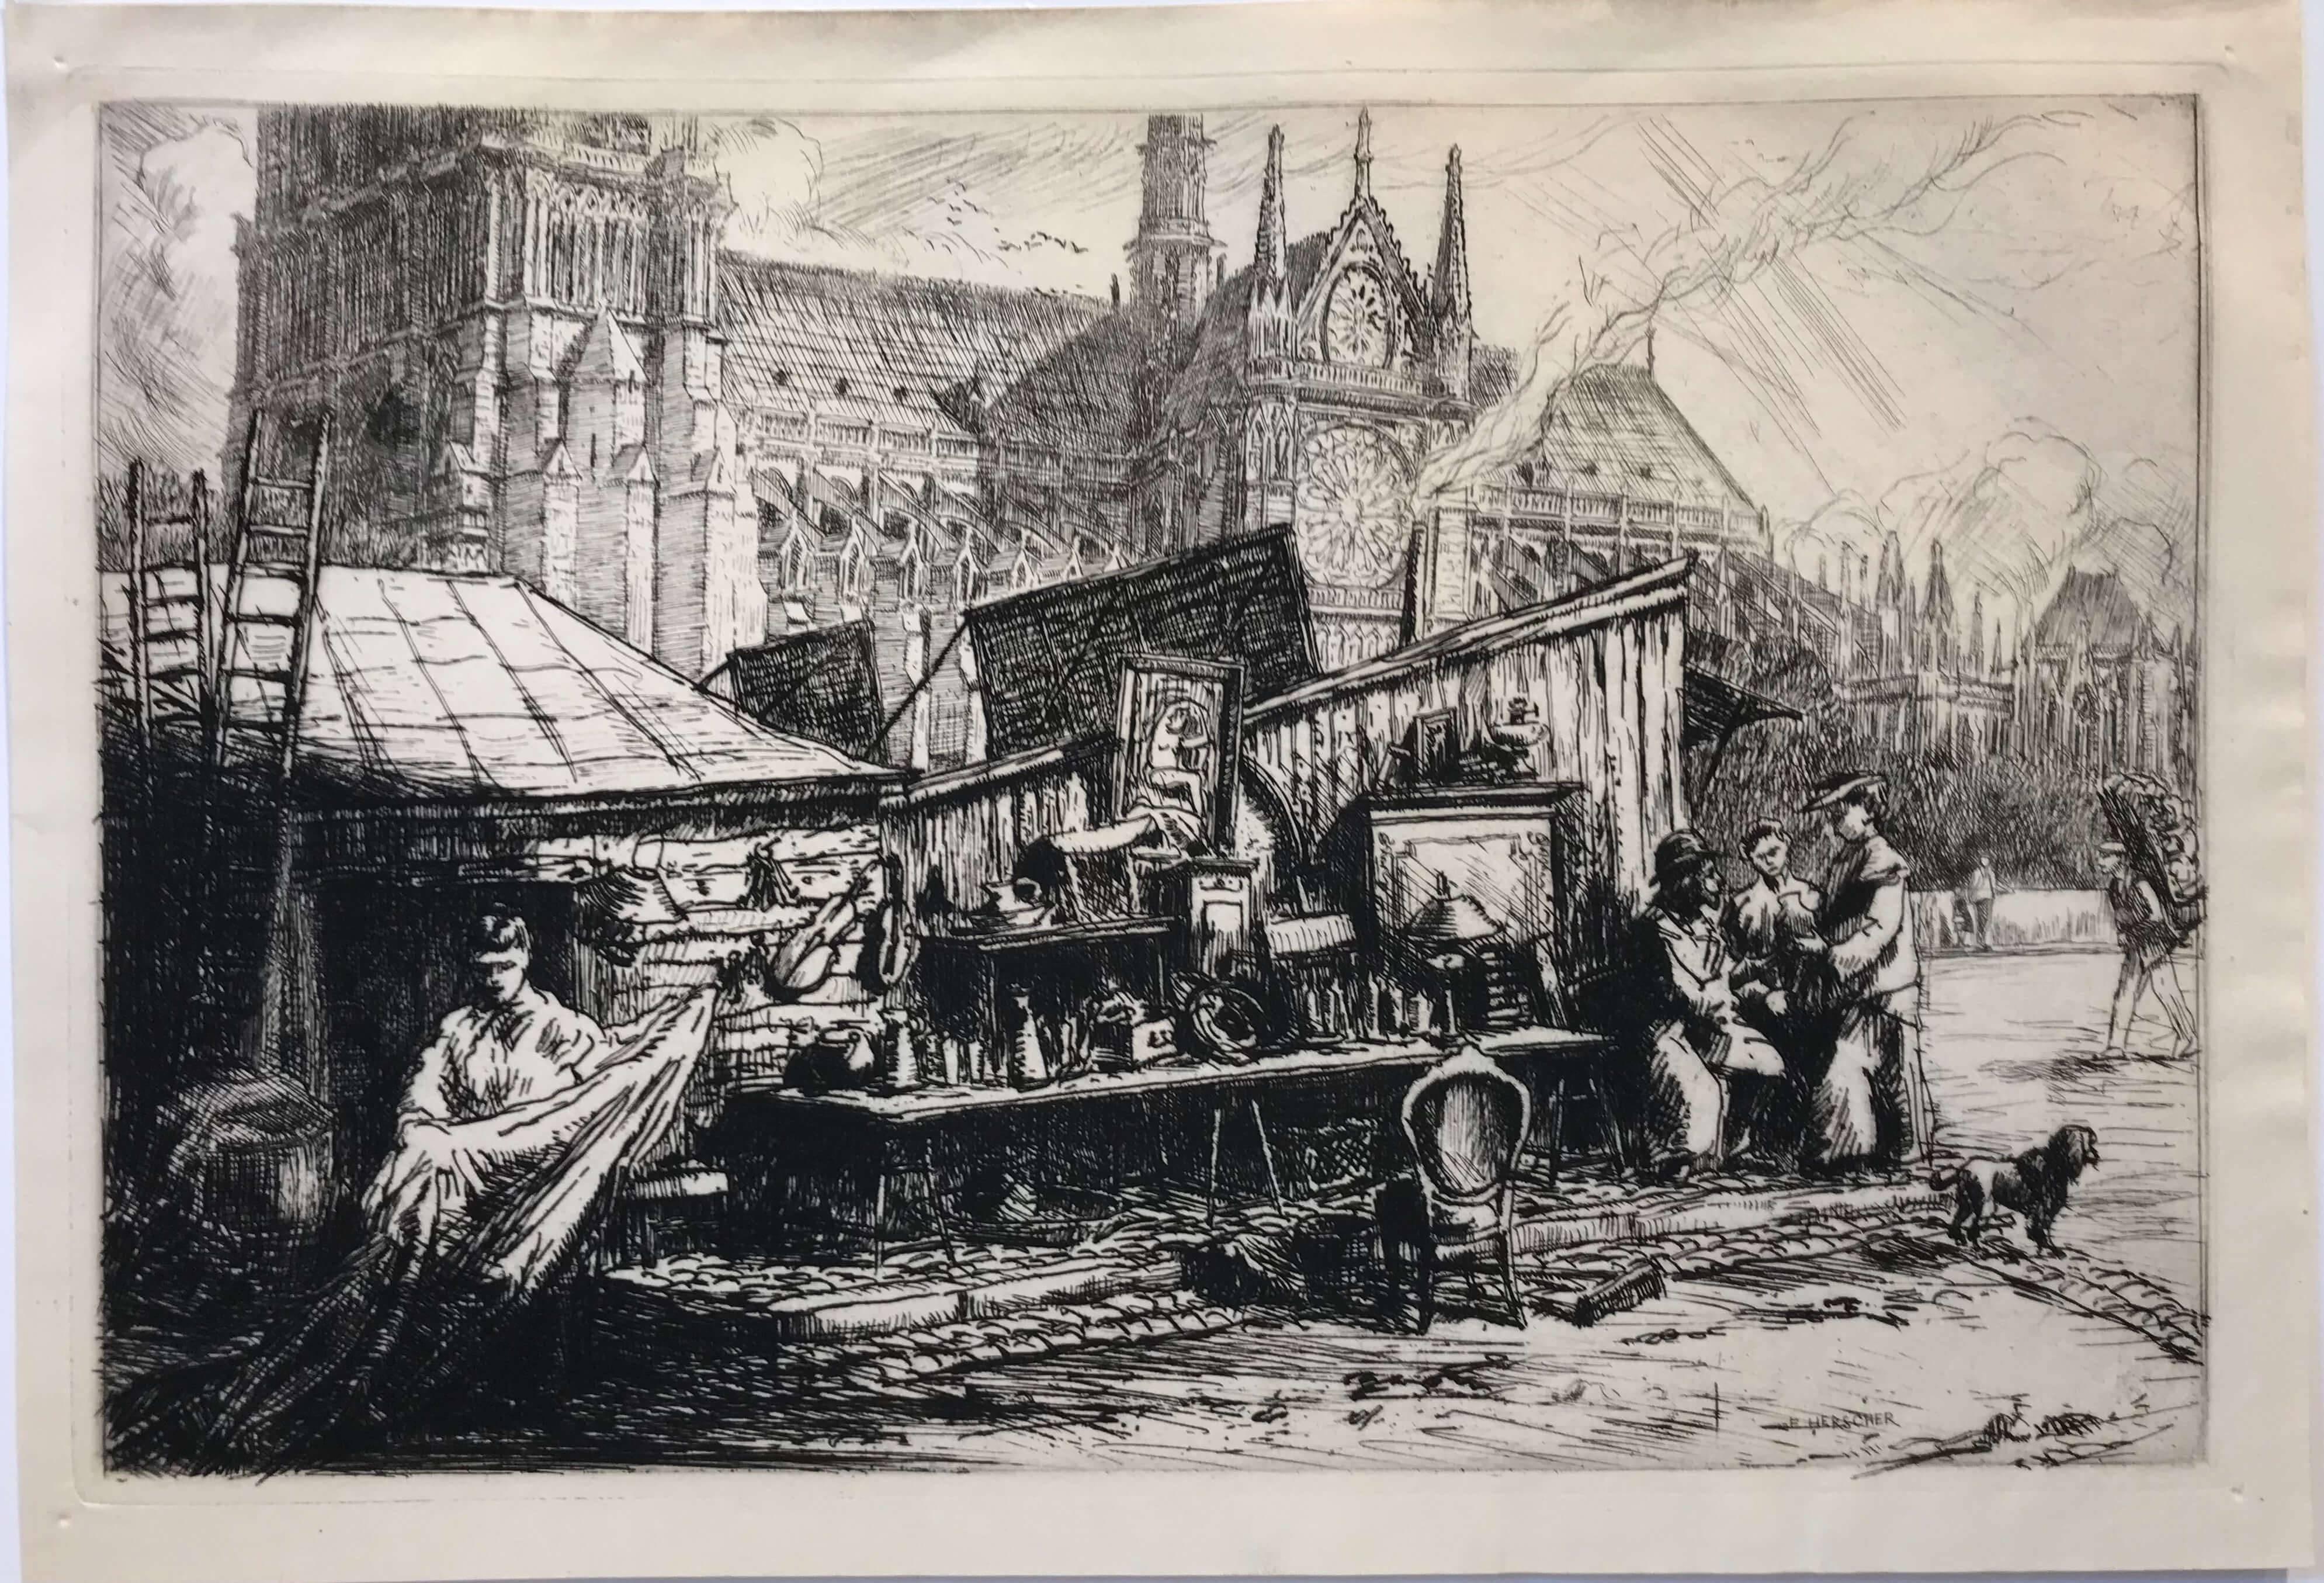 Souvenirs du Paris d'hier, E. HERSCHER 1912